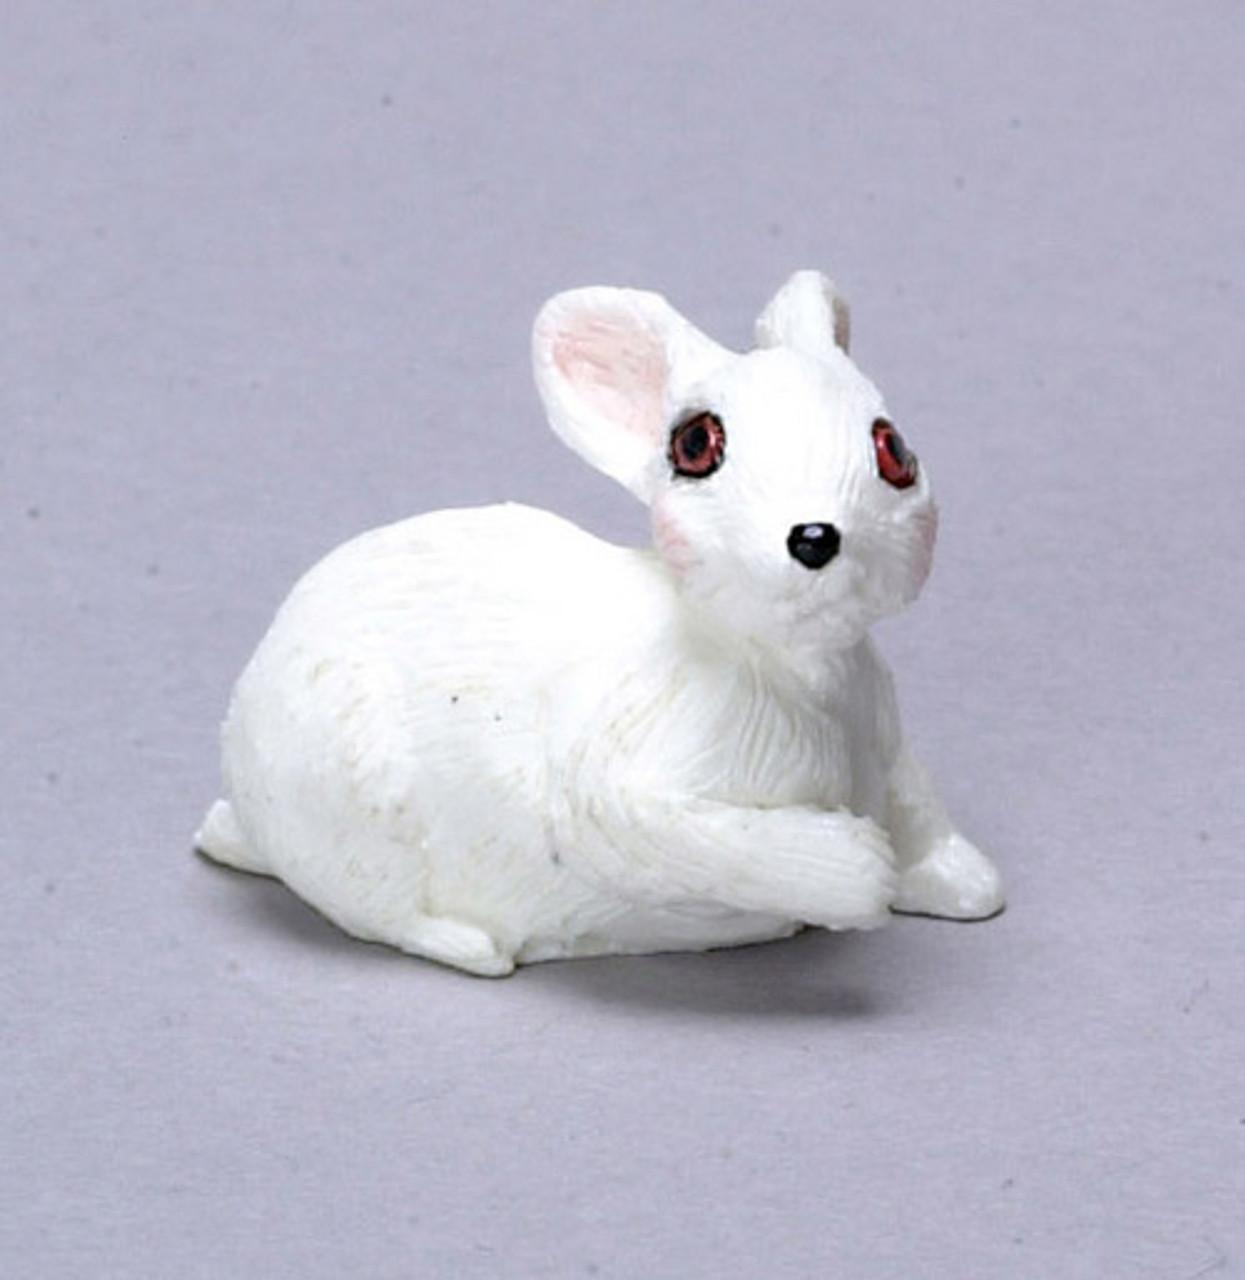 Dollhouse City - Dollhouse Miniatures Rabbit - White